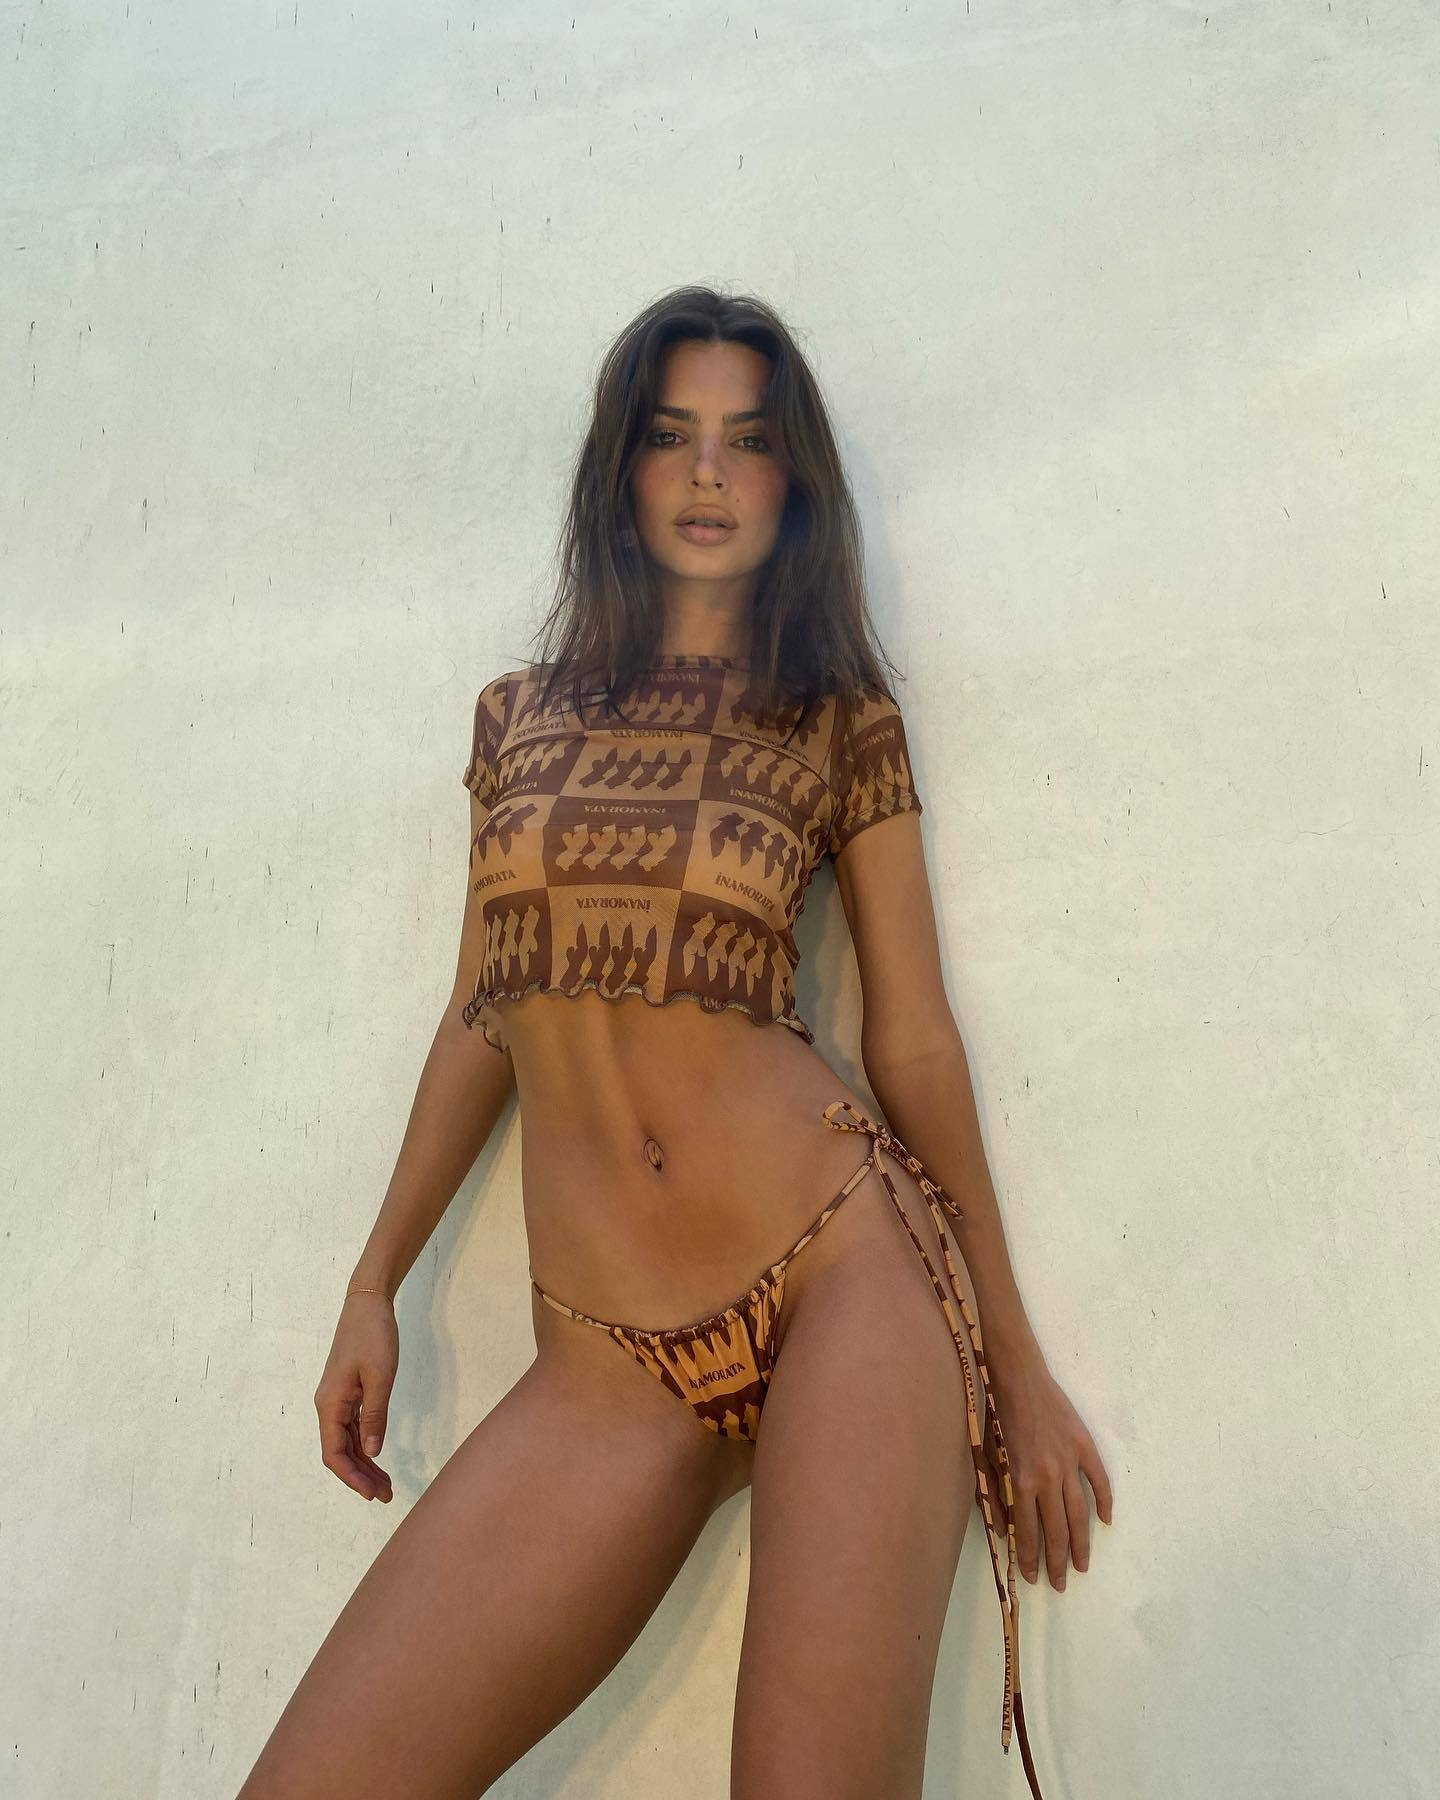 Emily Ratajkowski – Beautiful Ass And Braless Boobs In Sexy Inamorata Photoshoot 0002